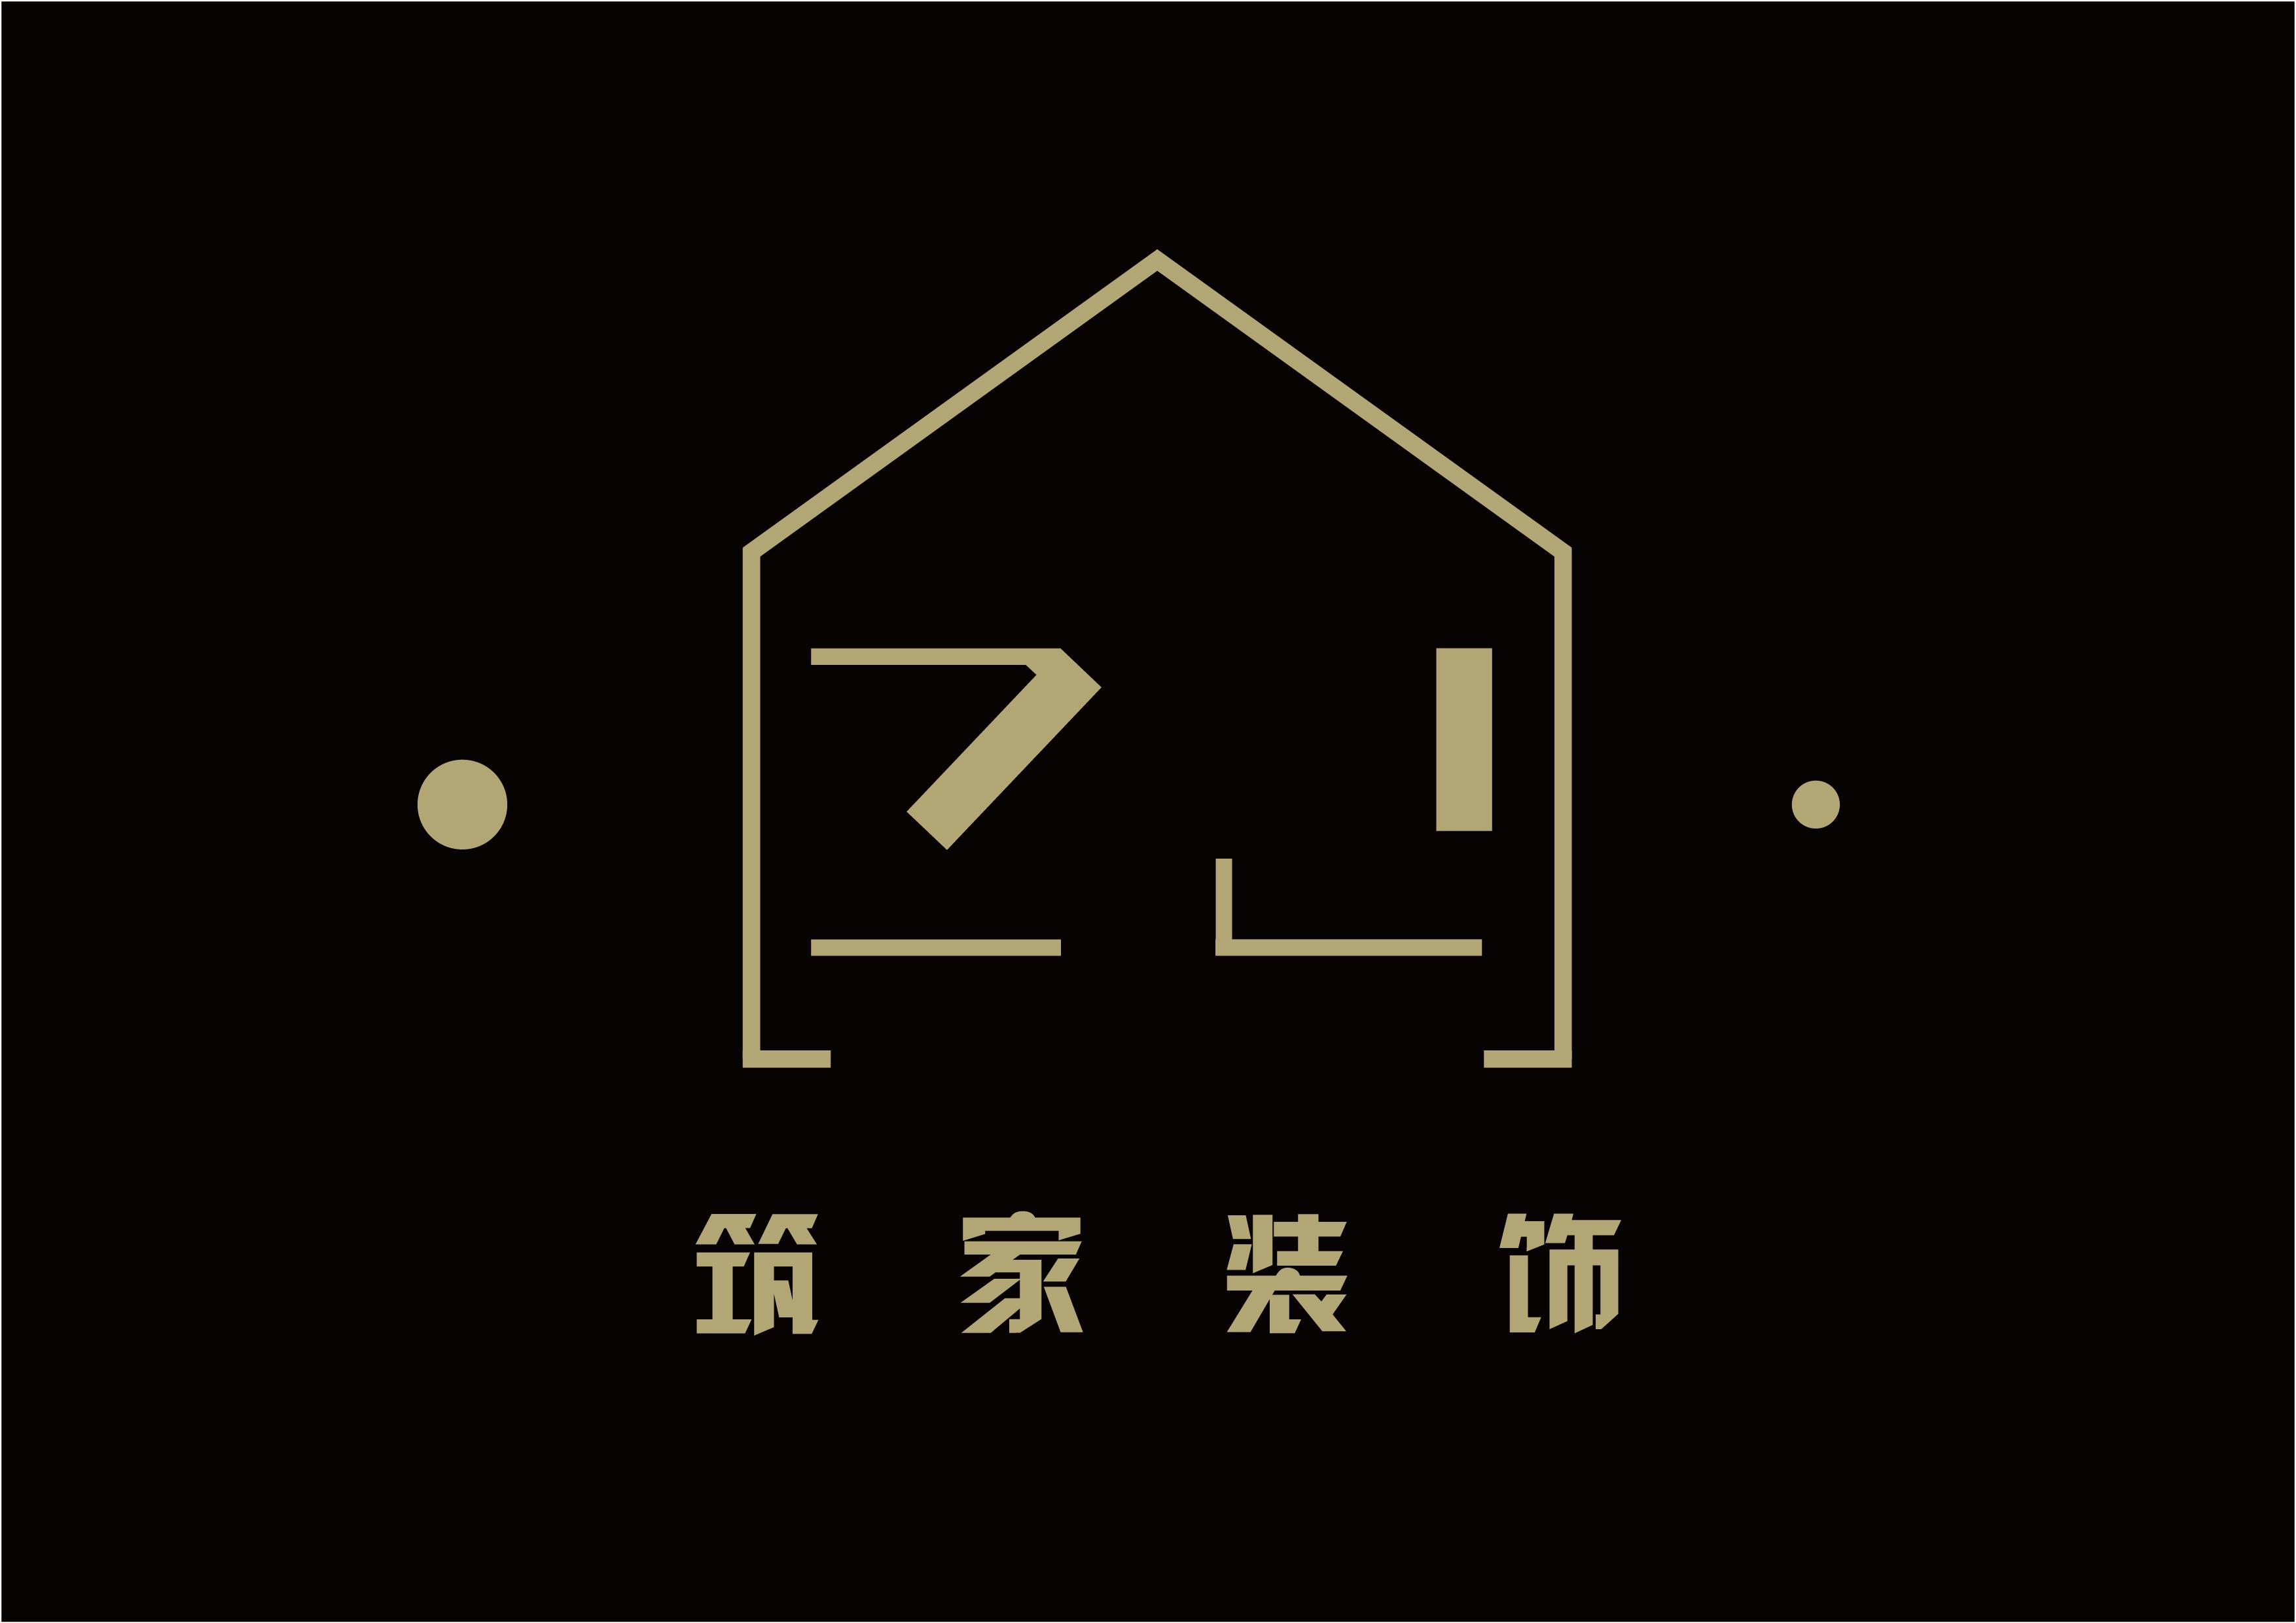 logo 标识 标志 设计 图标 3508_2480